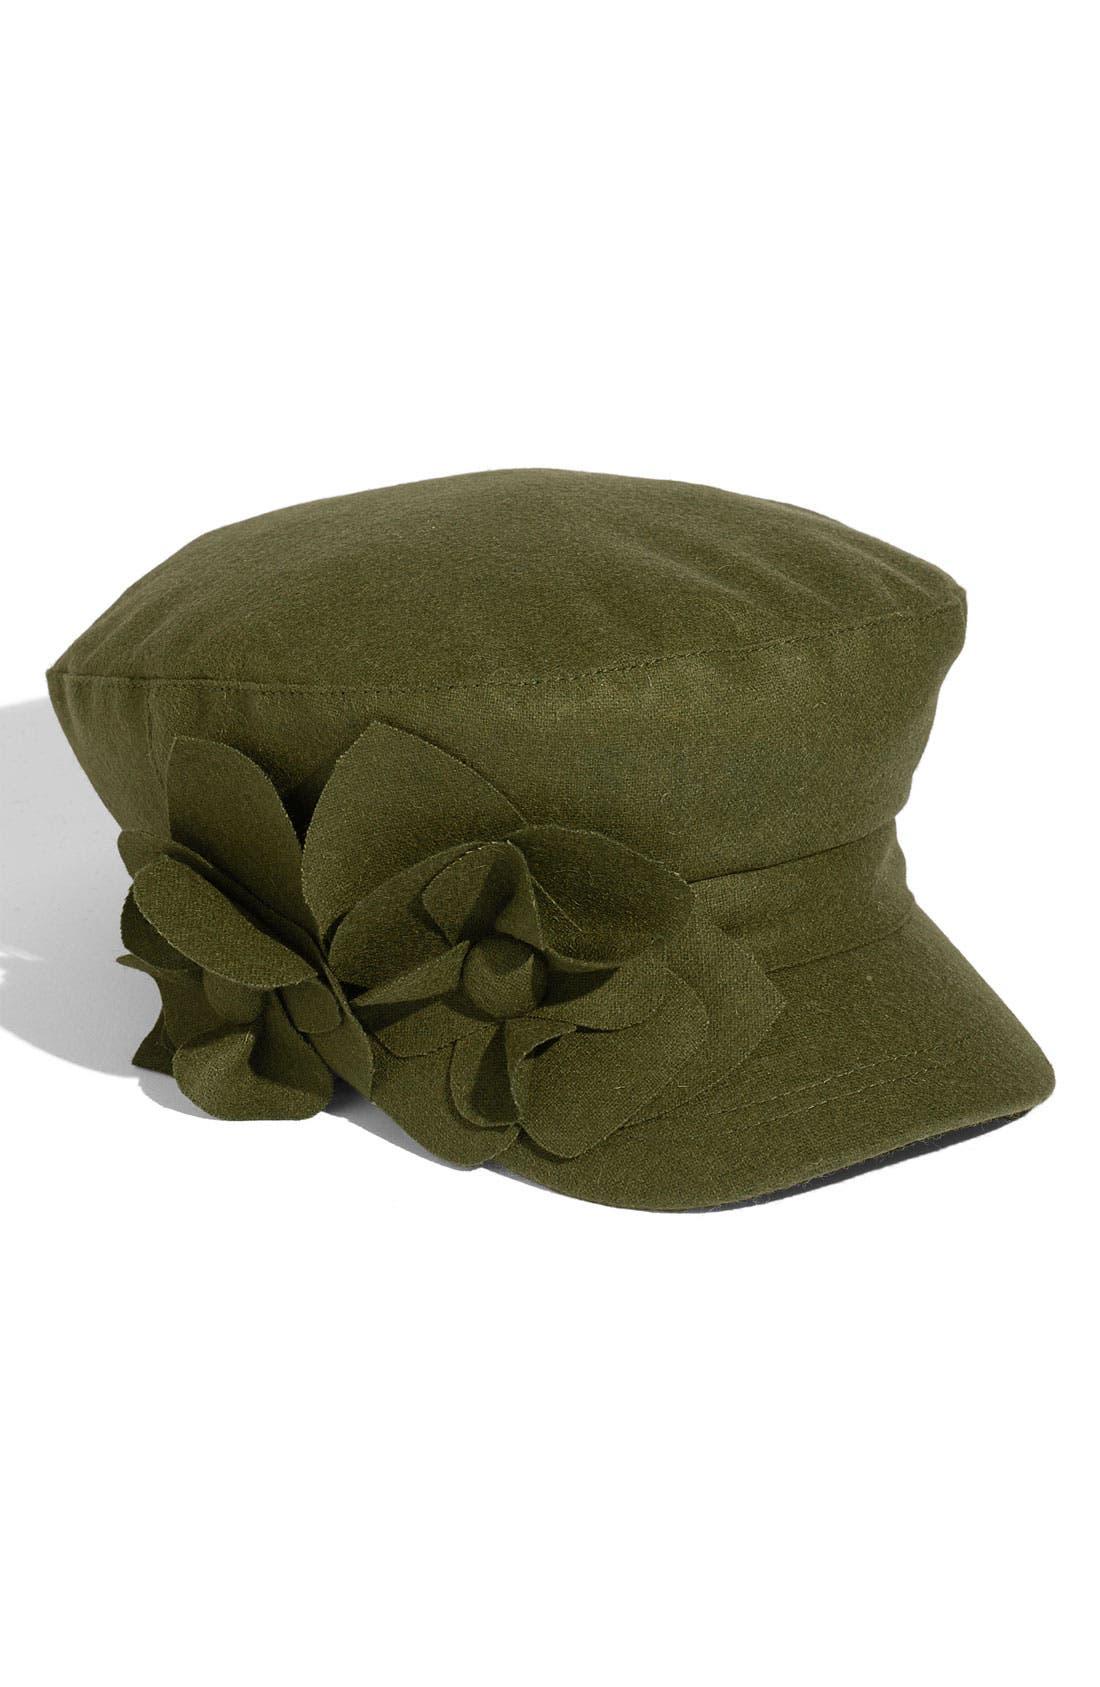 Main Image - August Hat 'Flower' Conductor Cap